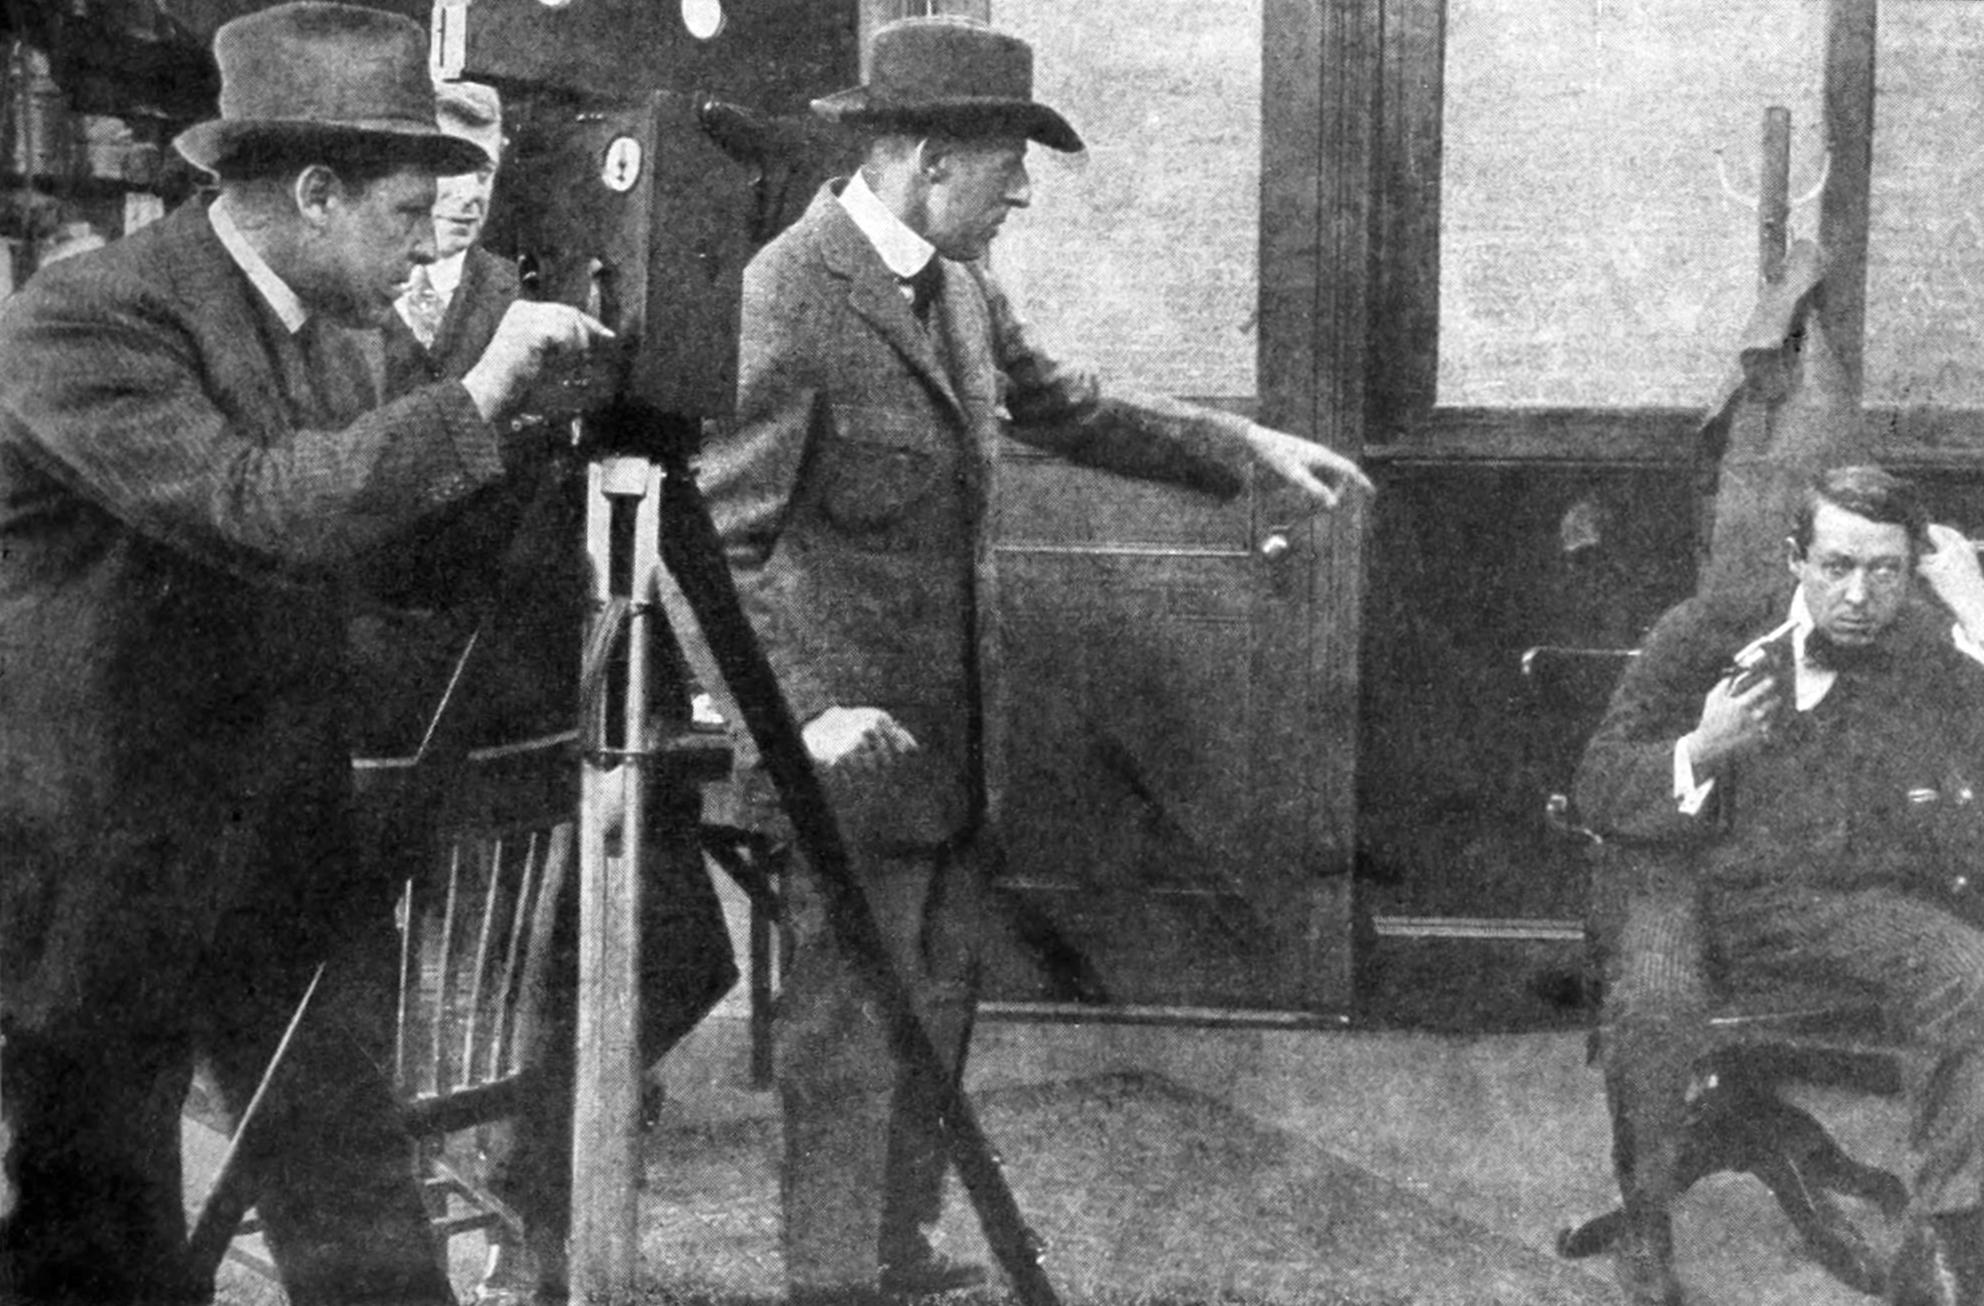 Arthur Griffith, Founder (1905) and Third leader (1908 - 17)